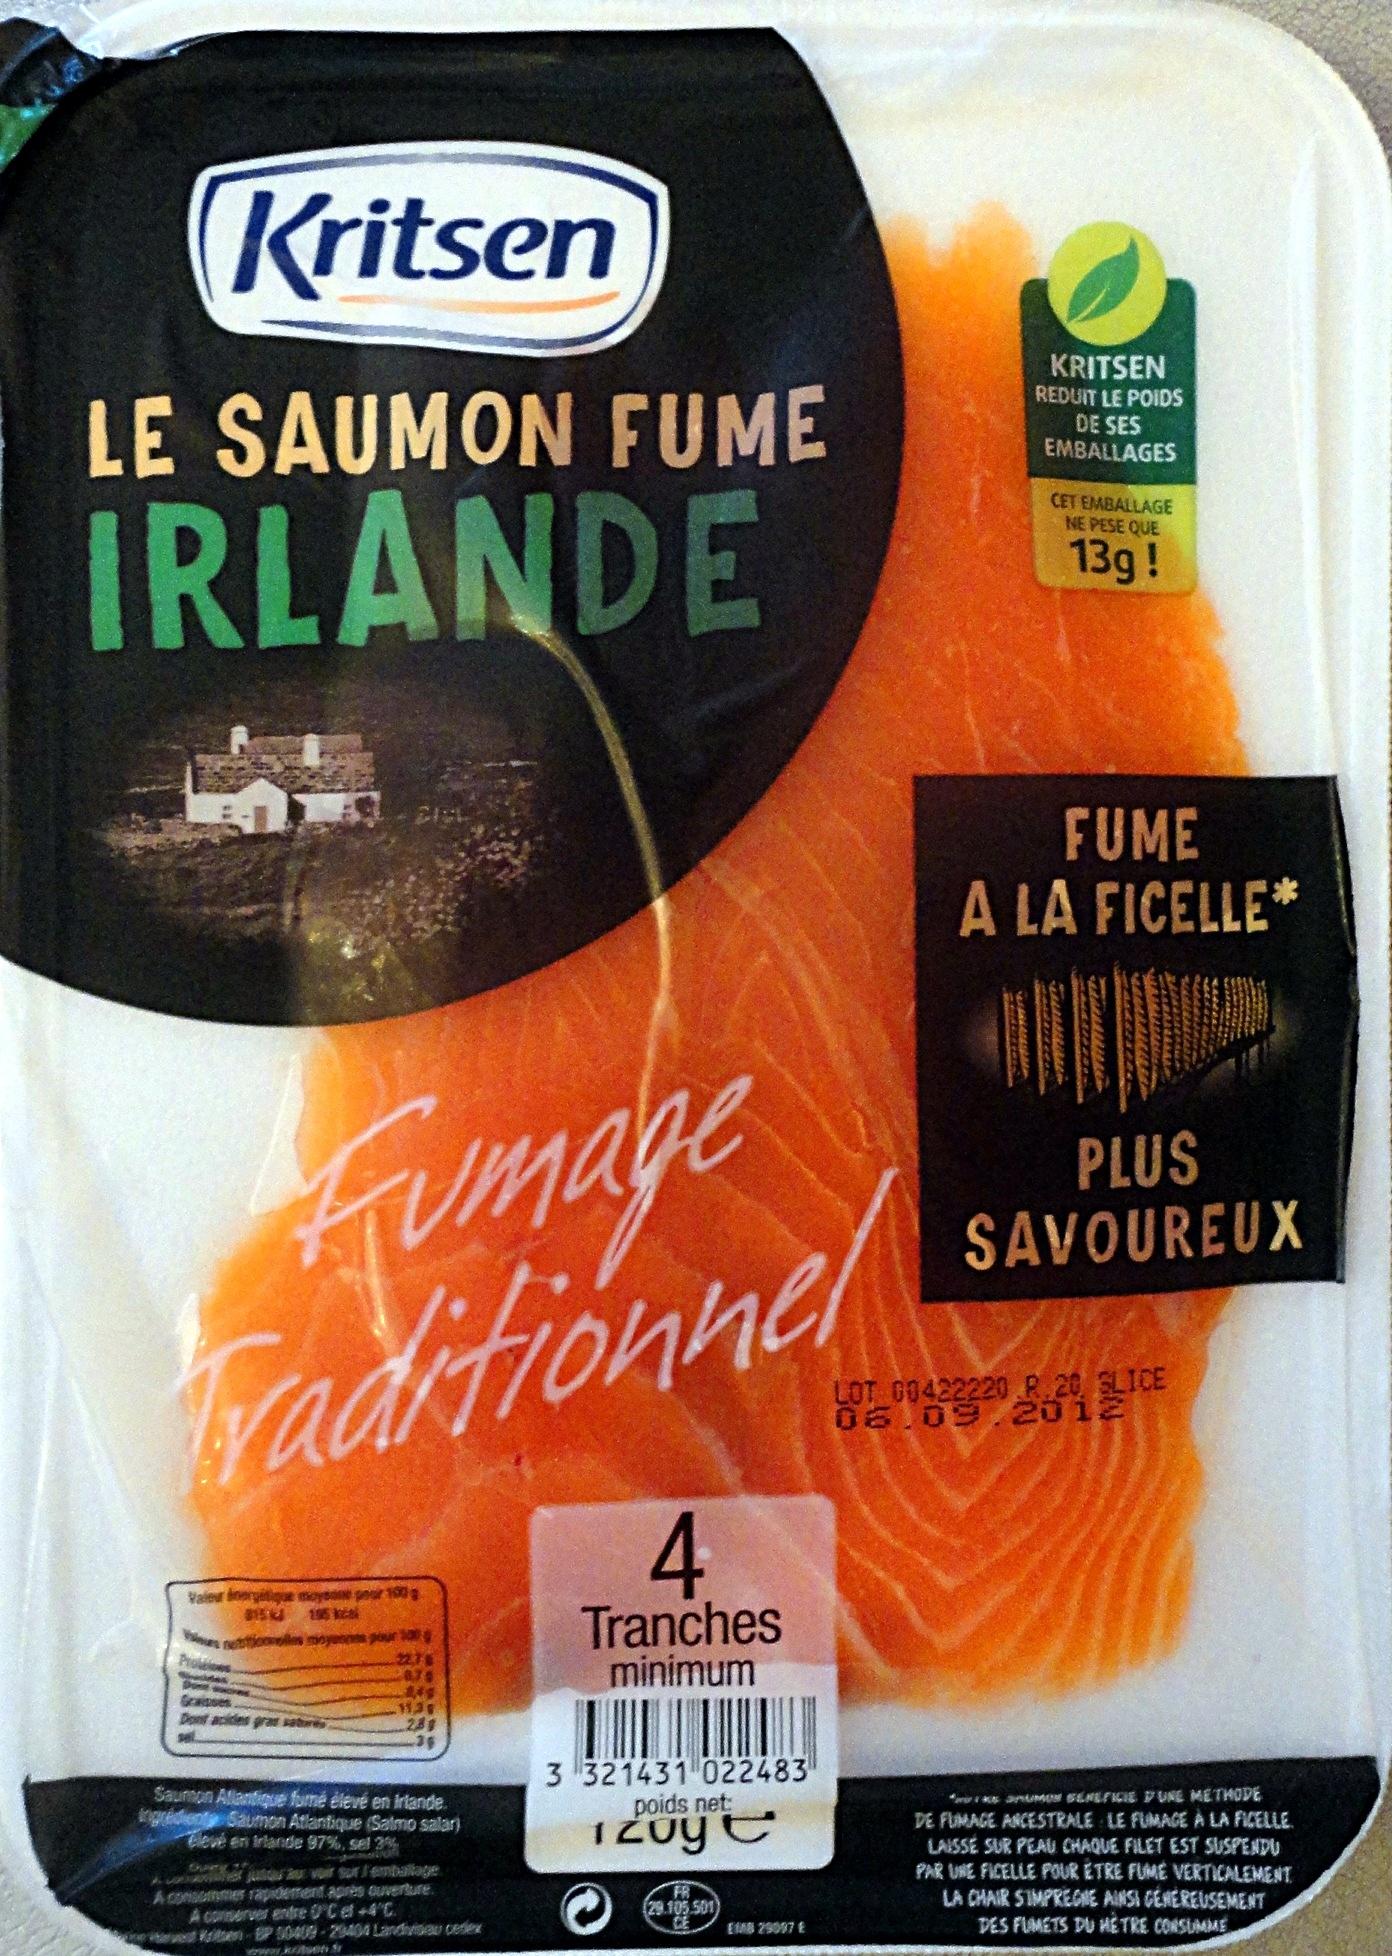 Saumon Fumé Irlande - Product